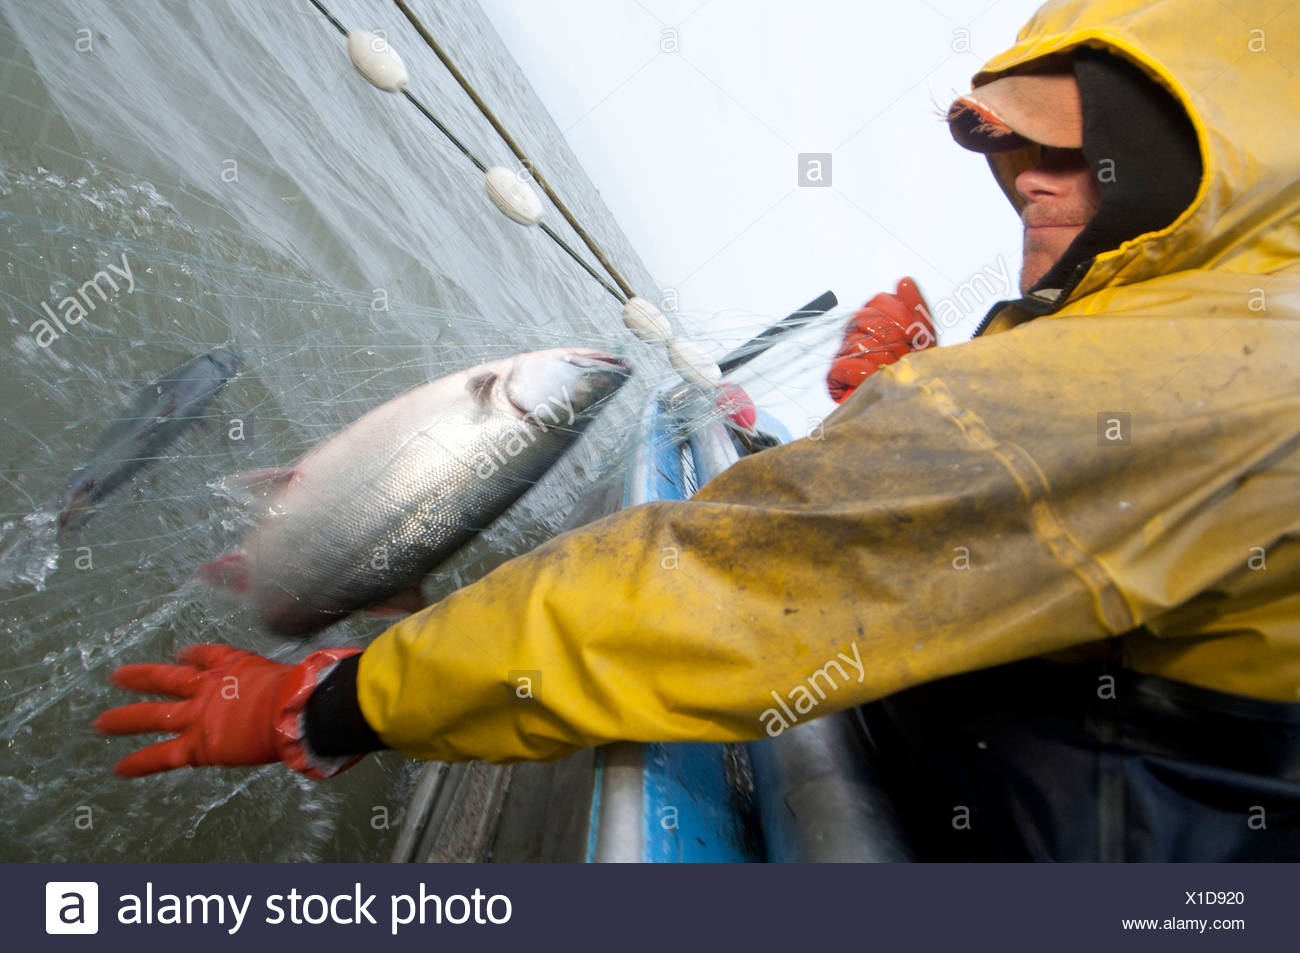 Commercial fisherman picks sockeye salmon off a set net in the Naknek River, Bristol Bay, Alaska, Summer - Stock Image